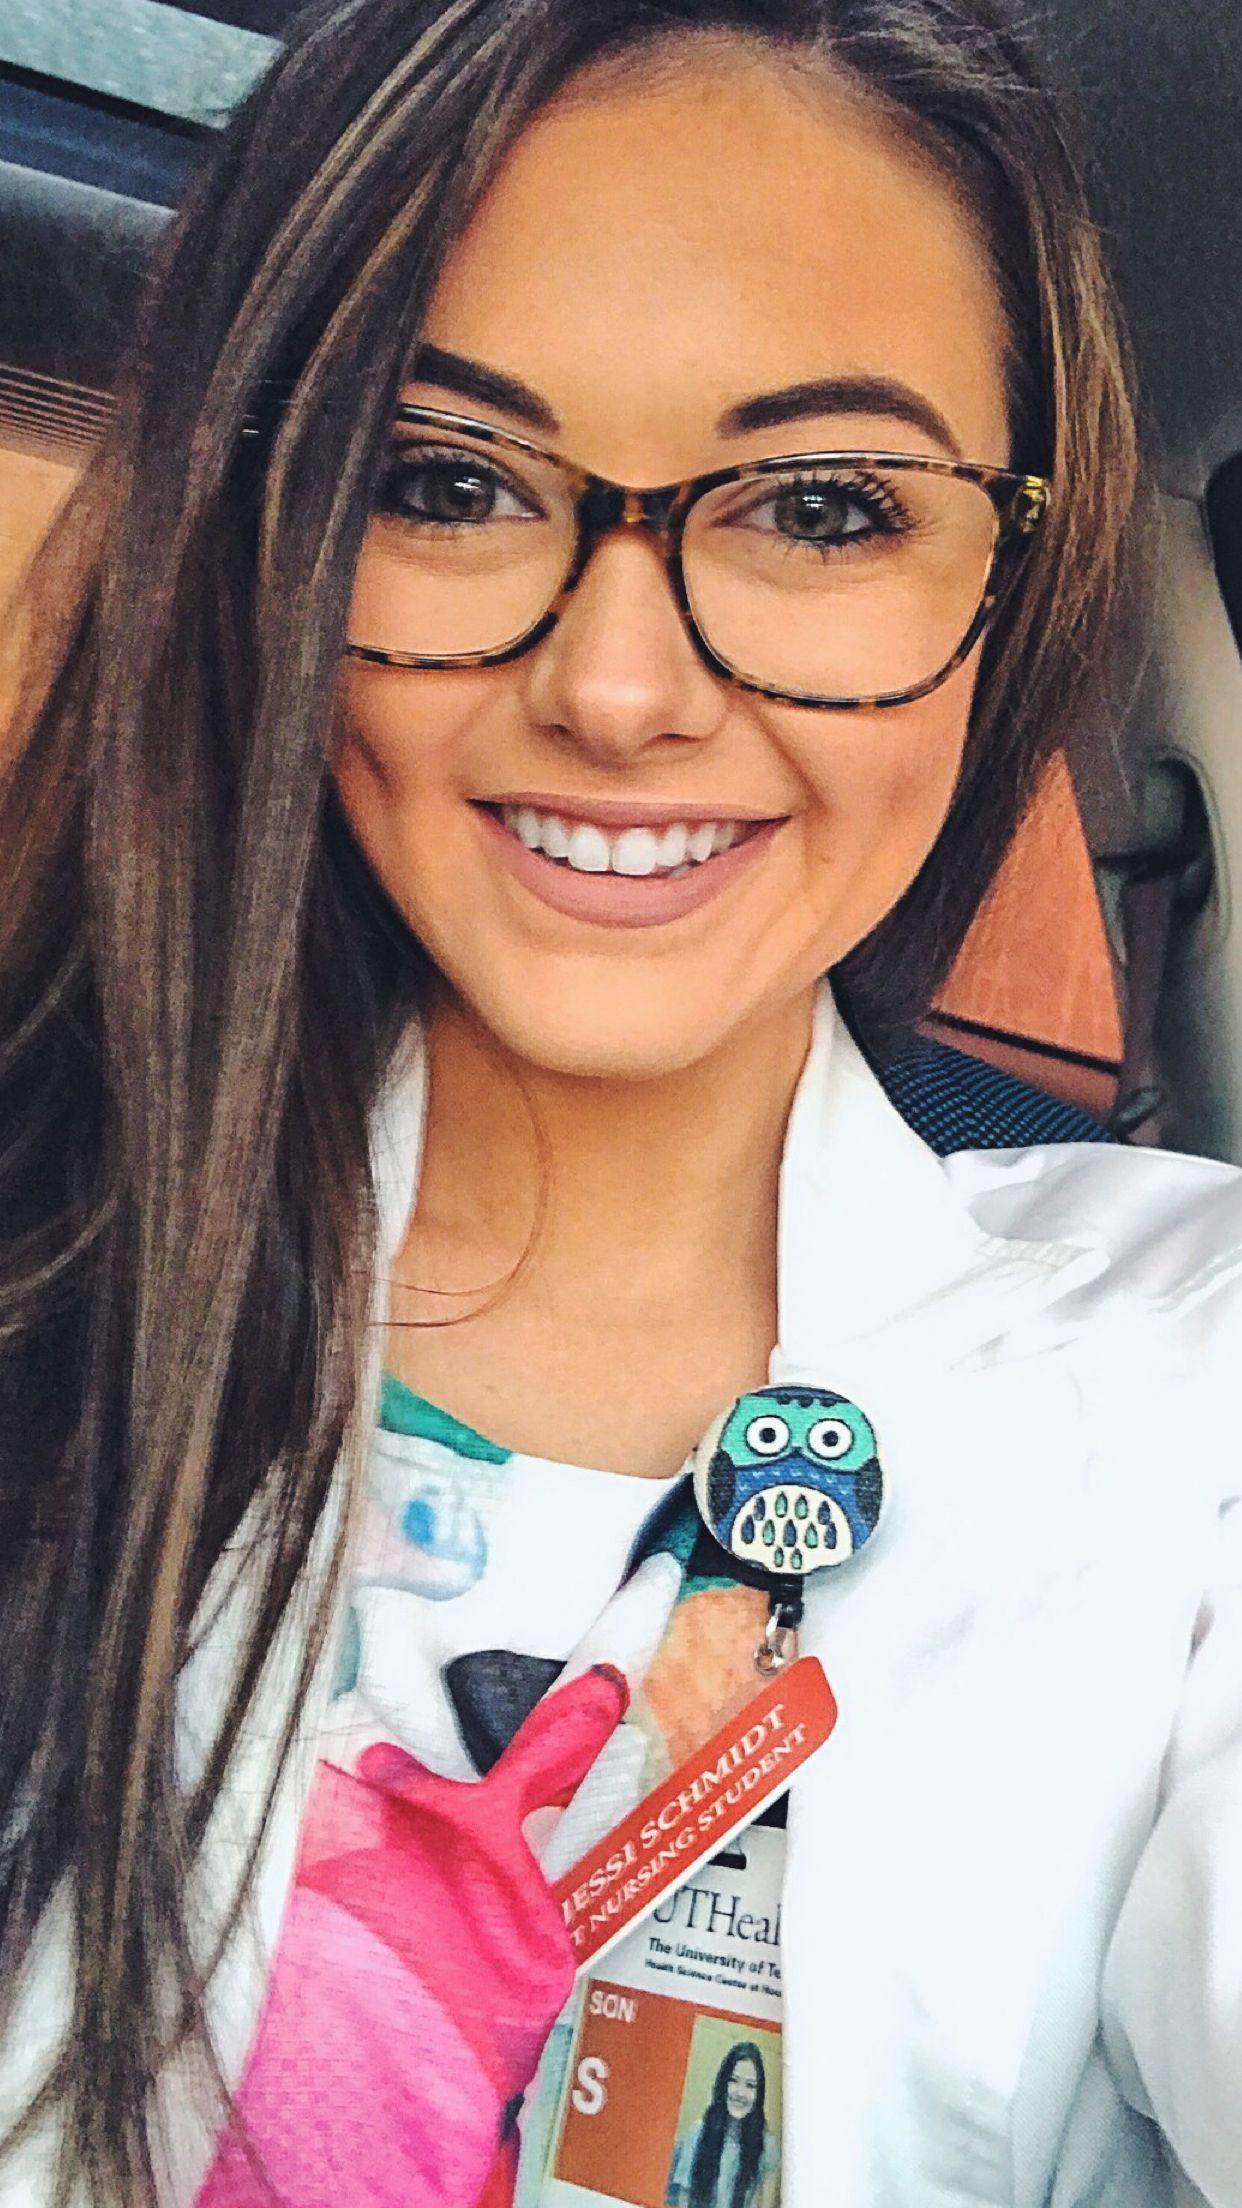 White coat | Nurse outfit scrubs, Beautiful nurse, Nursing fashion